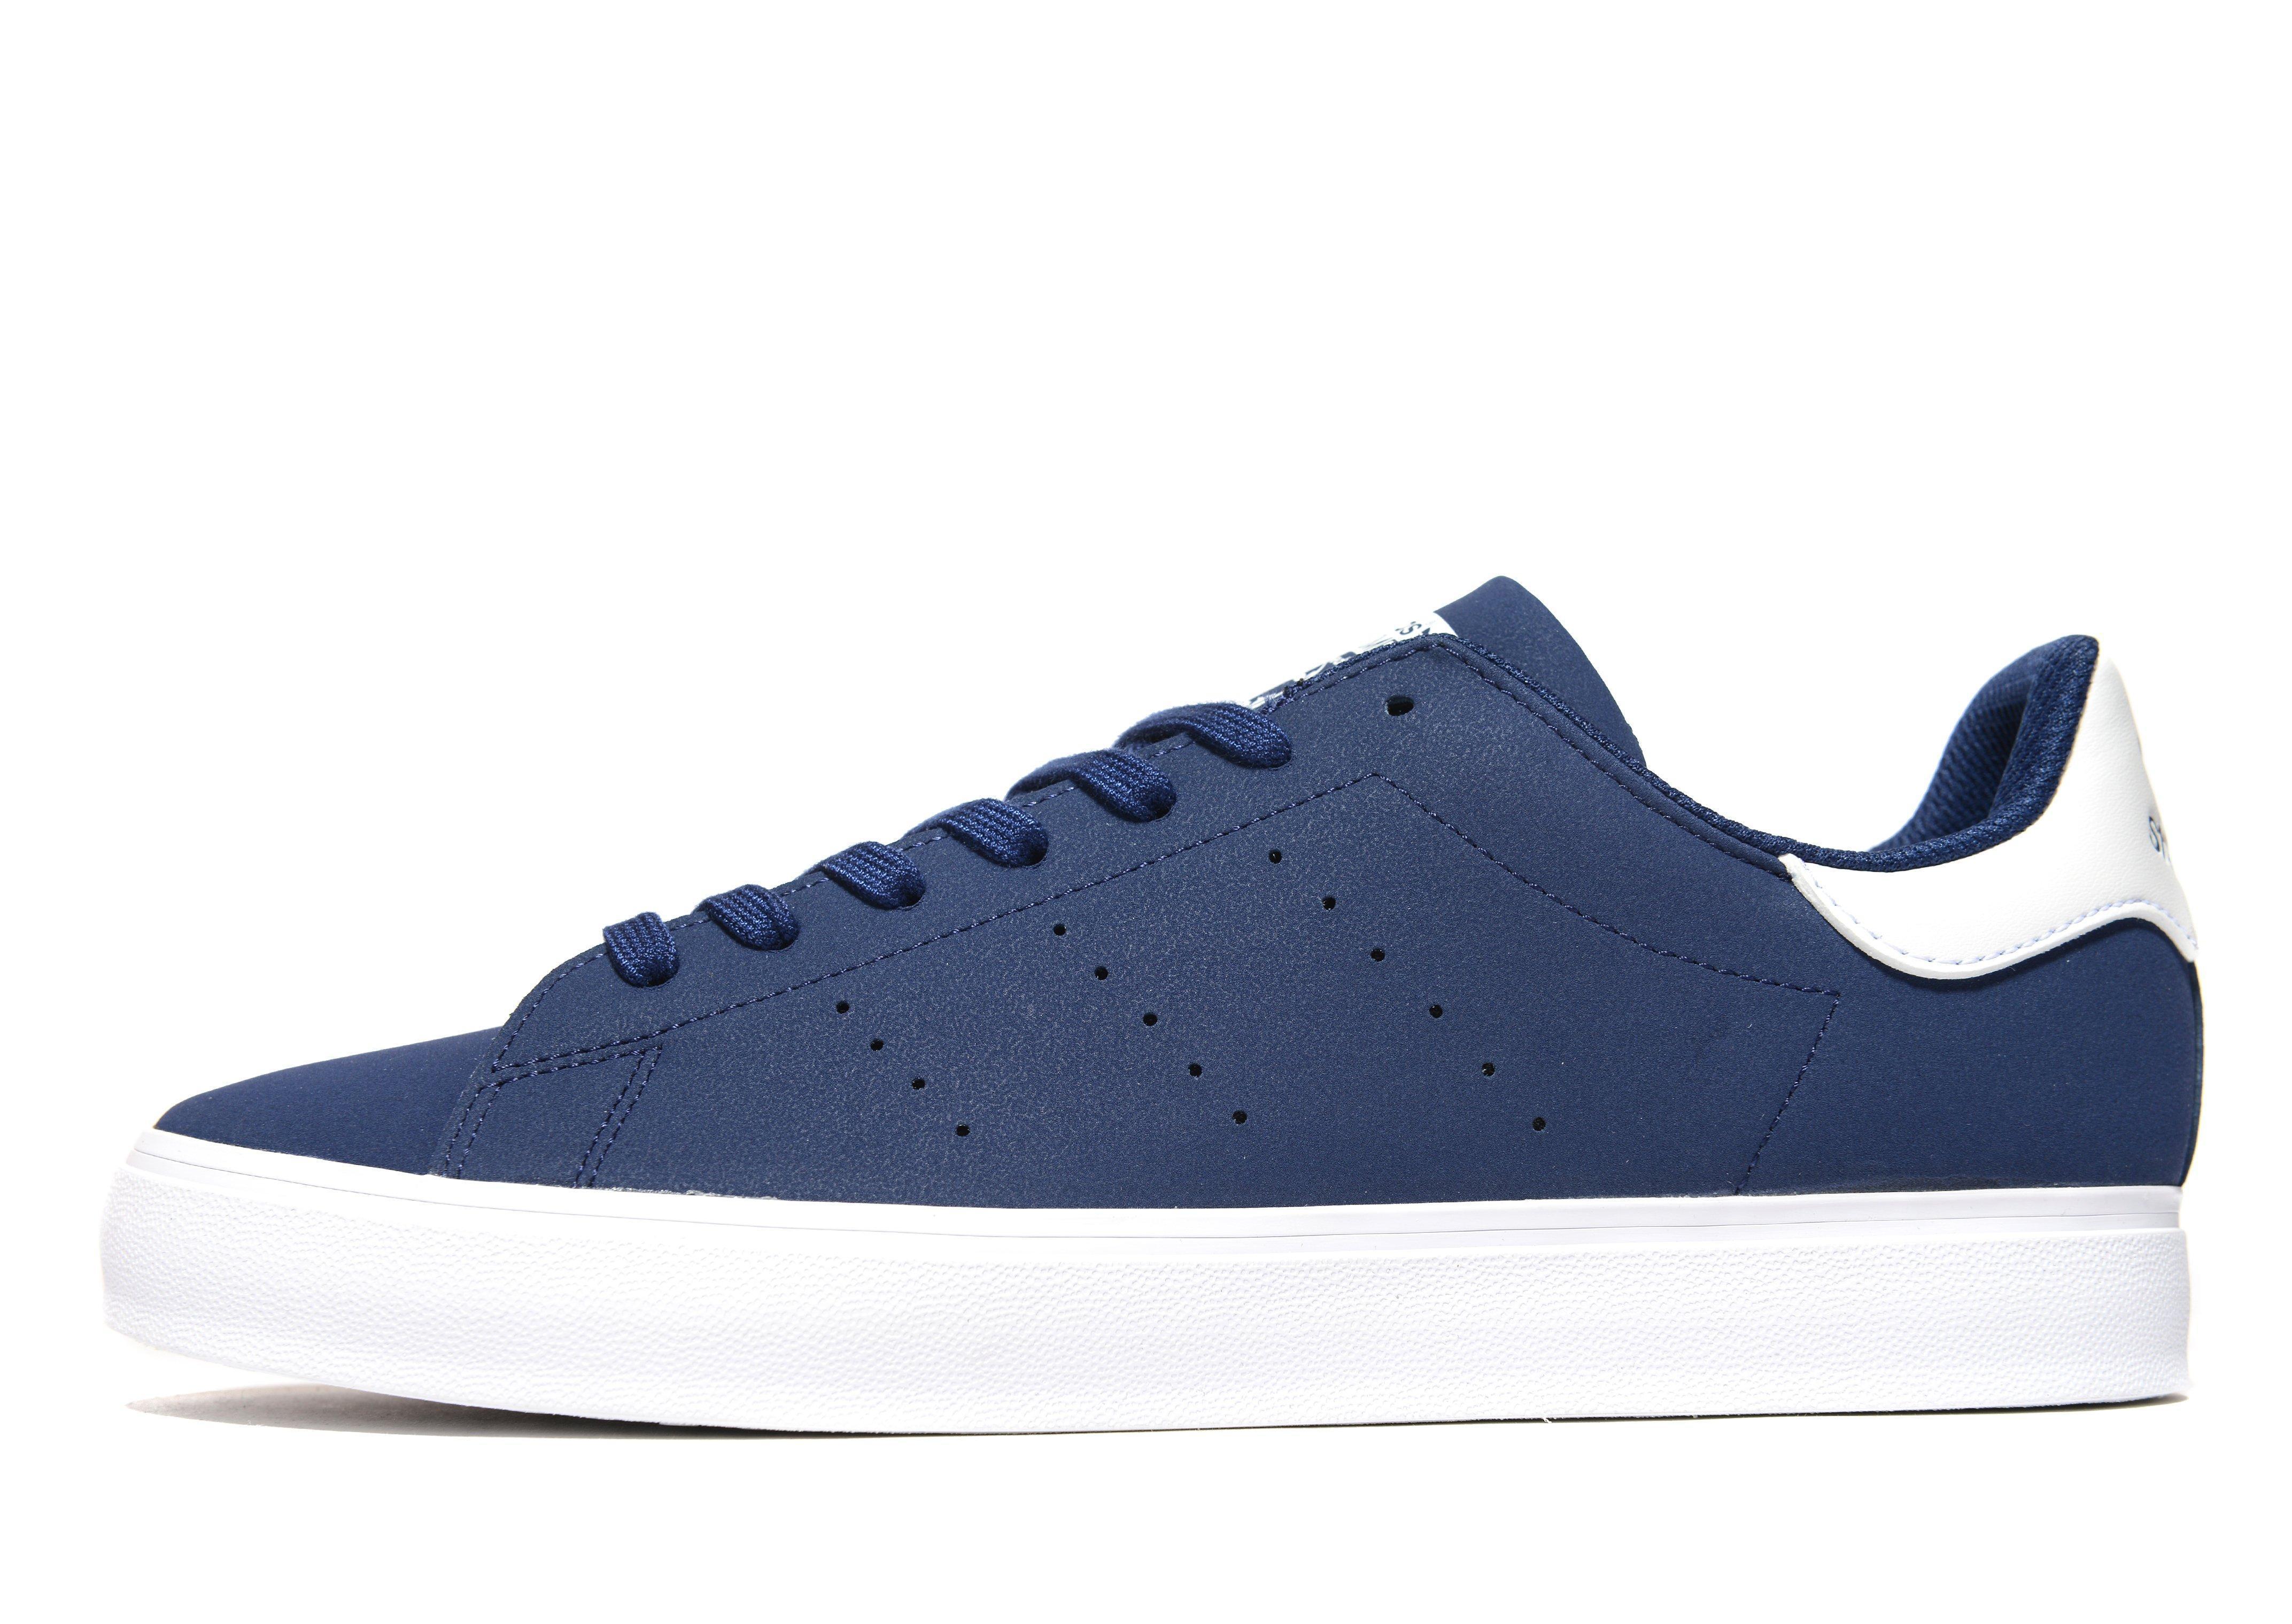 Adidas Stan Smith Vulc Shoes